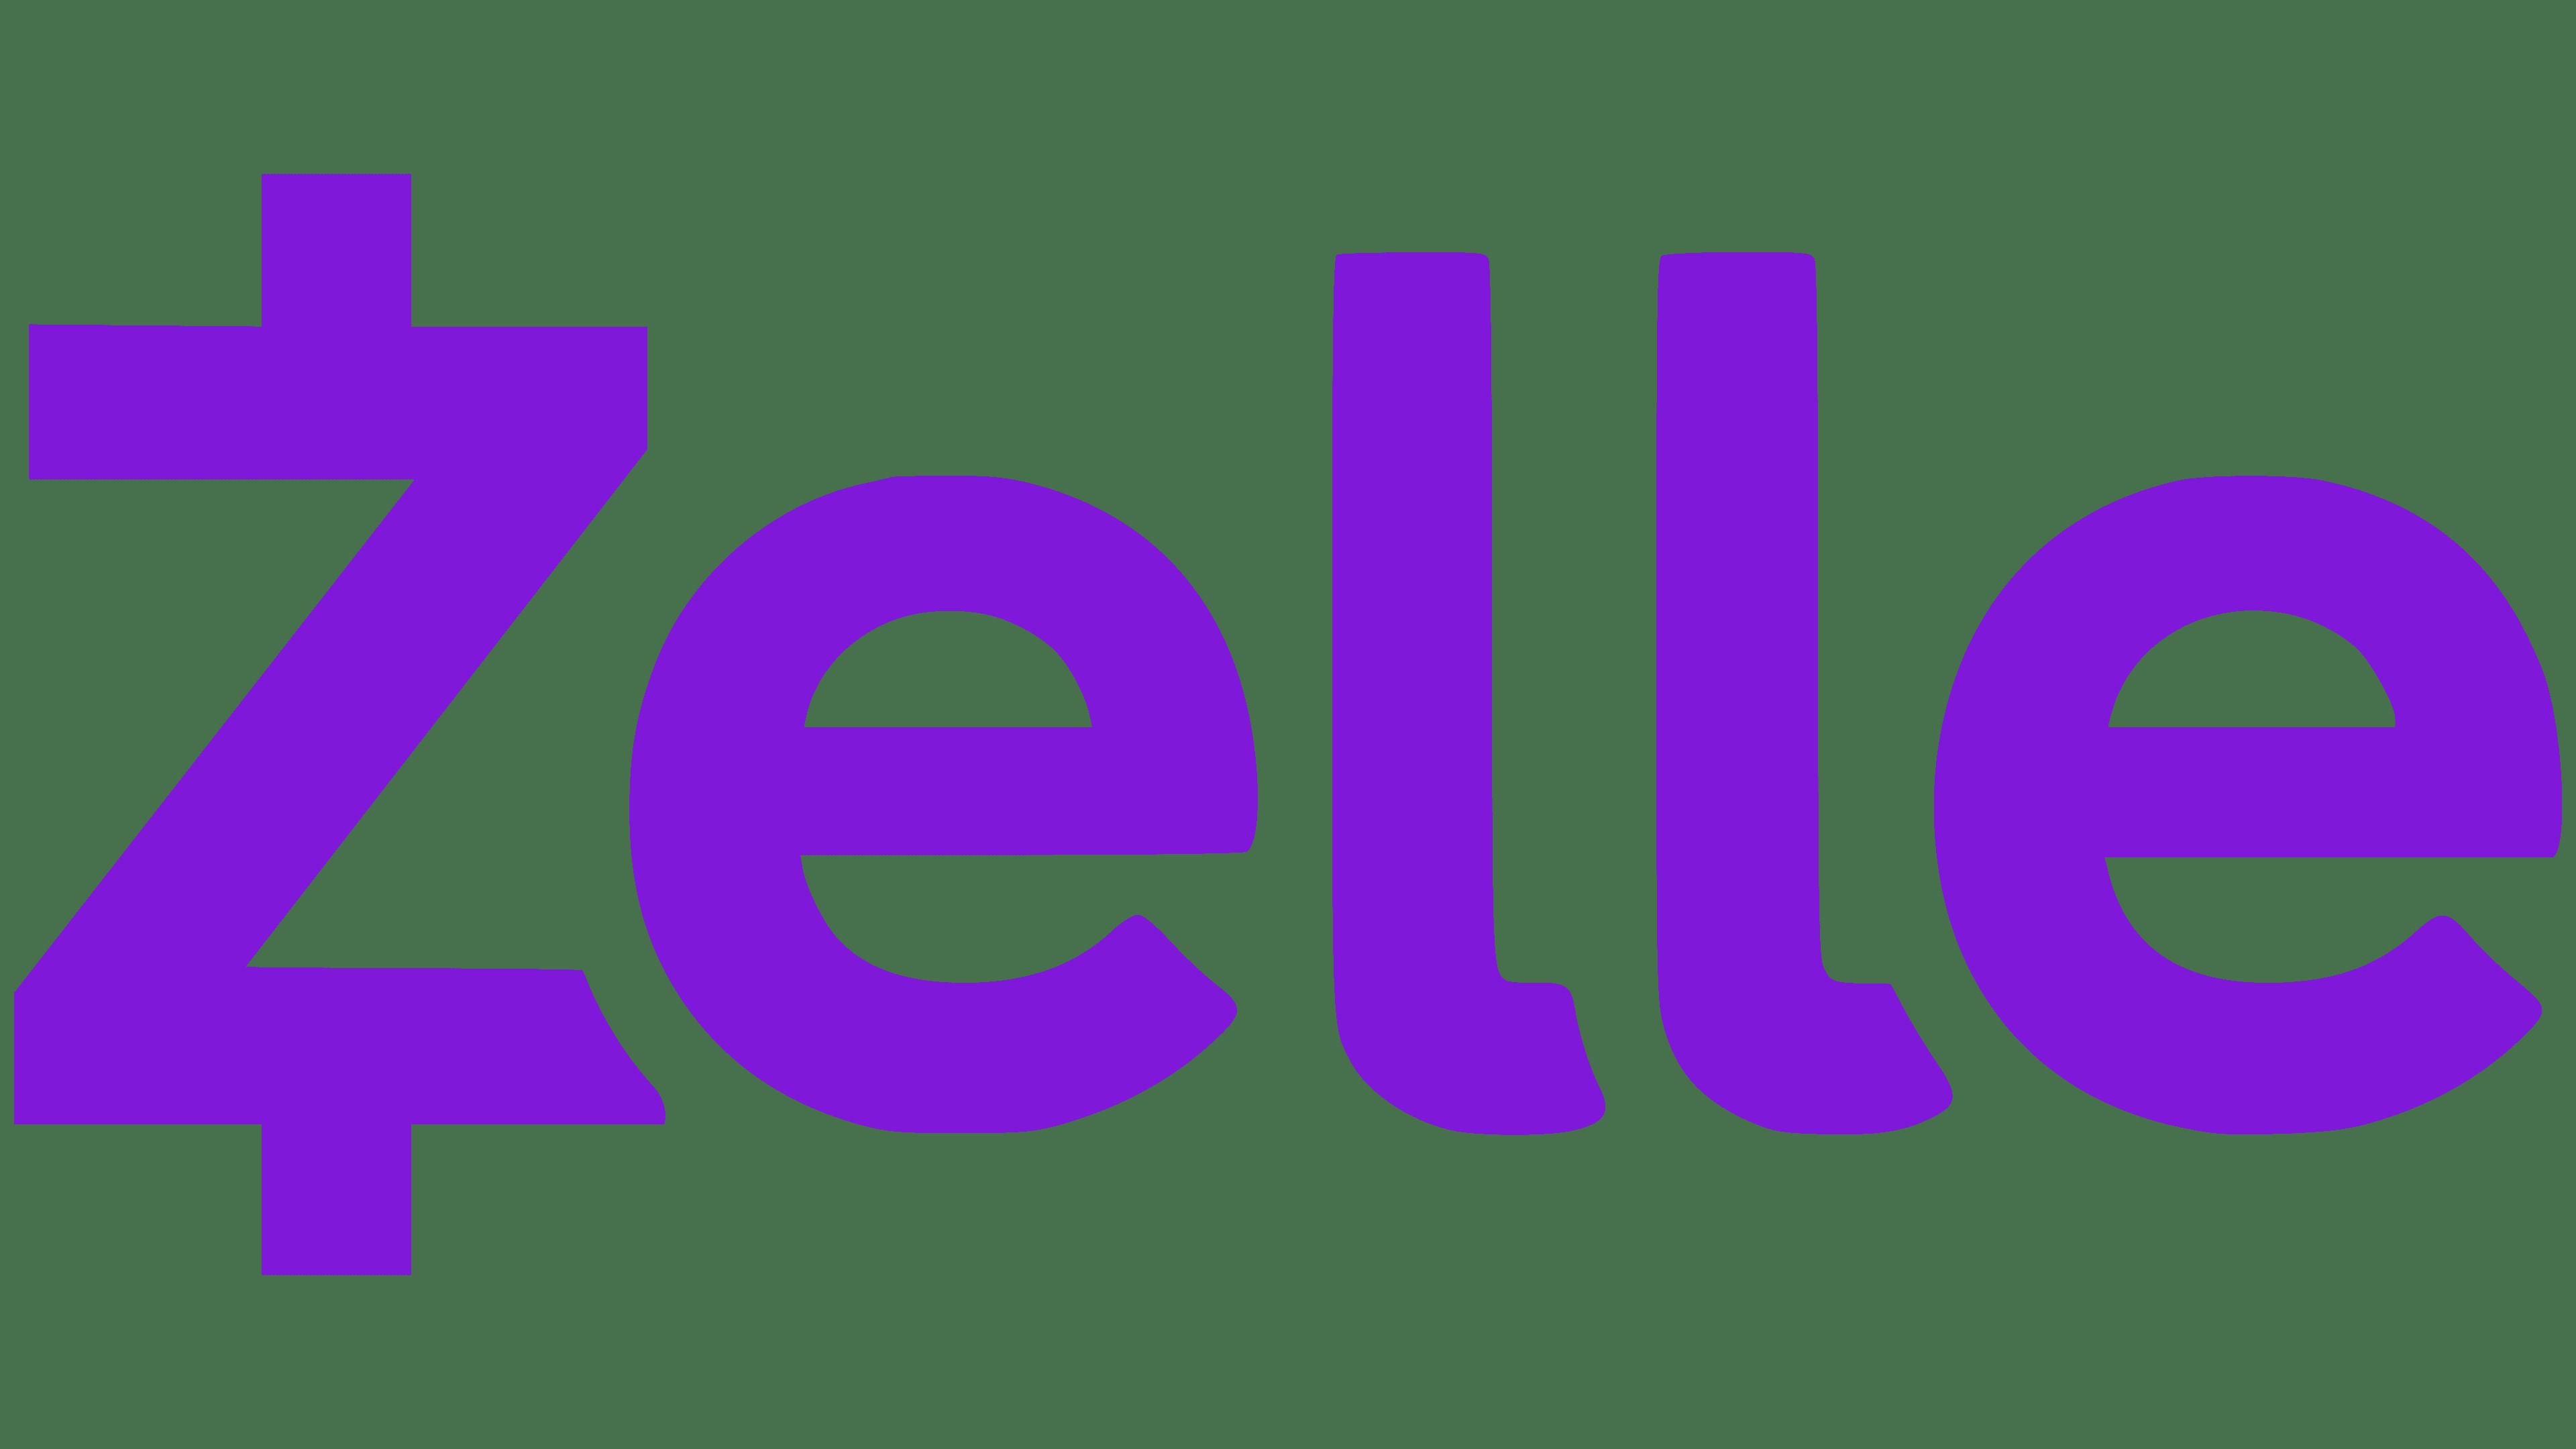 Logo de Zelle